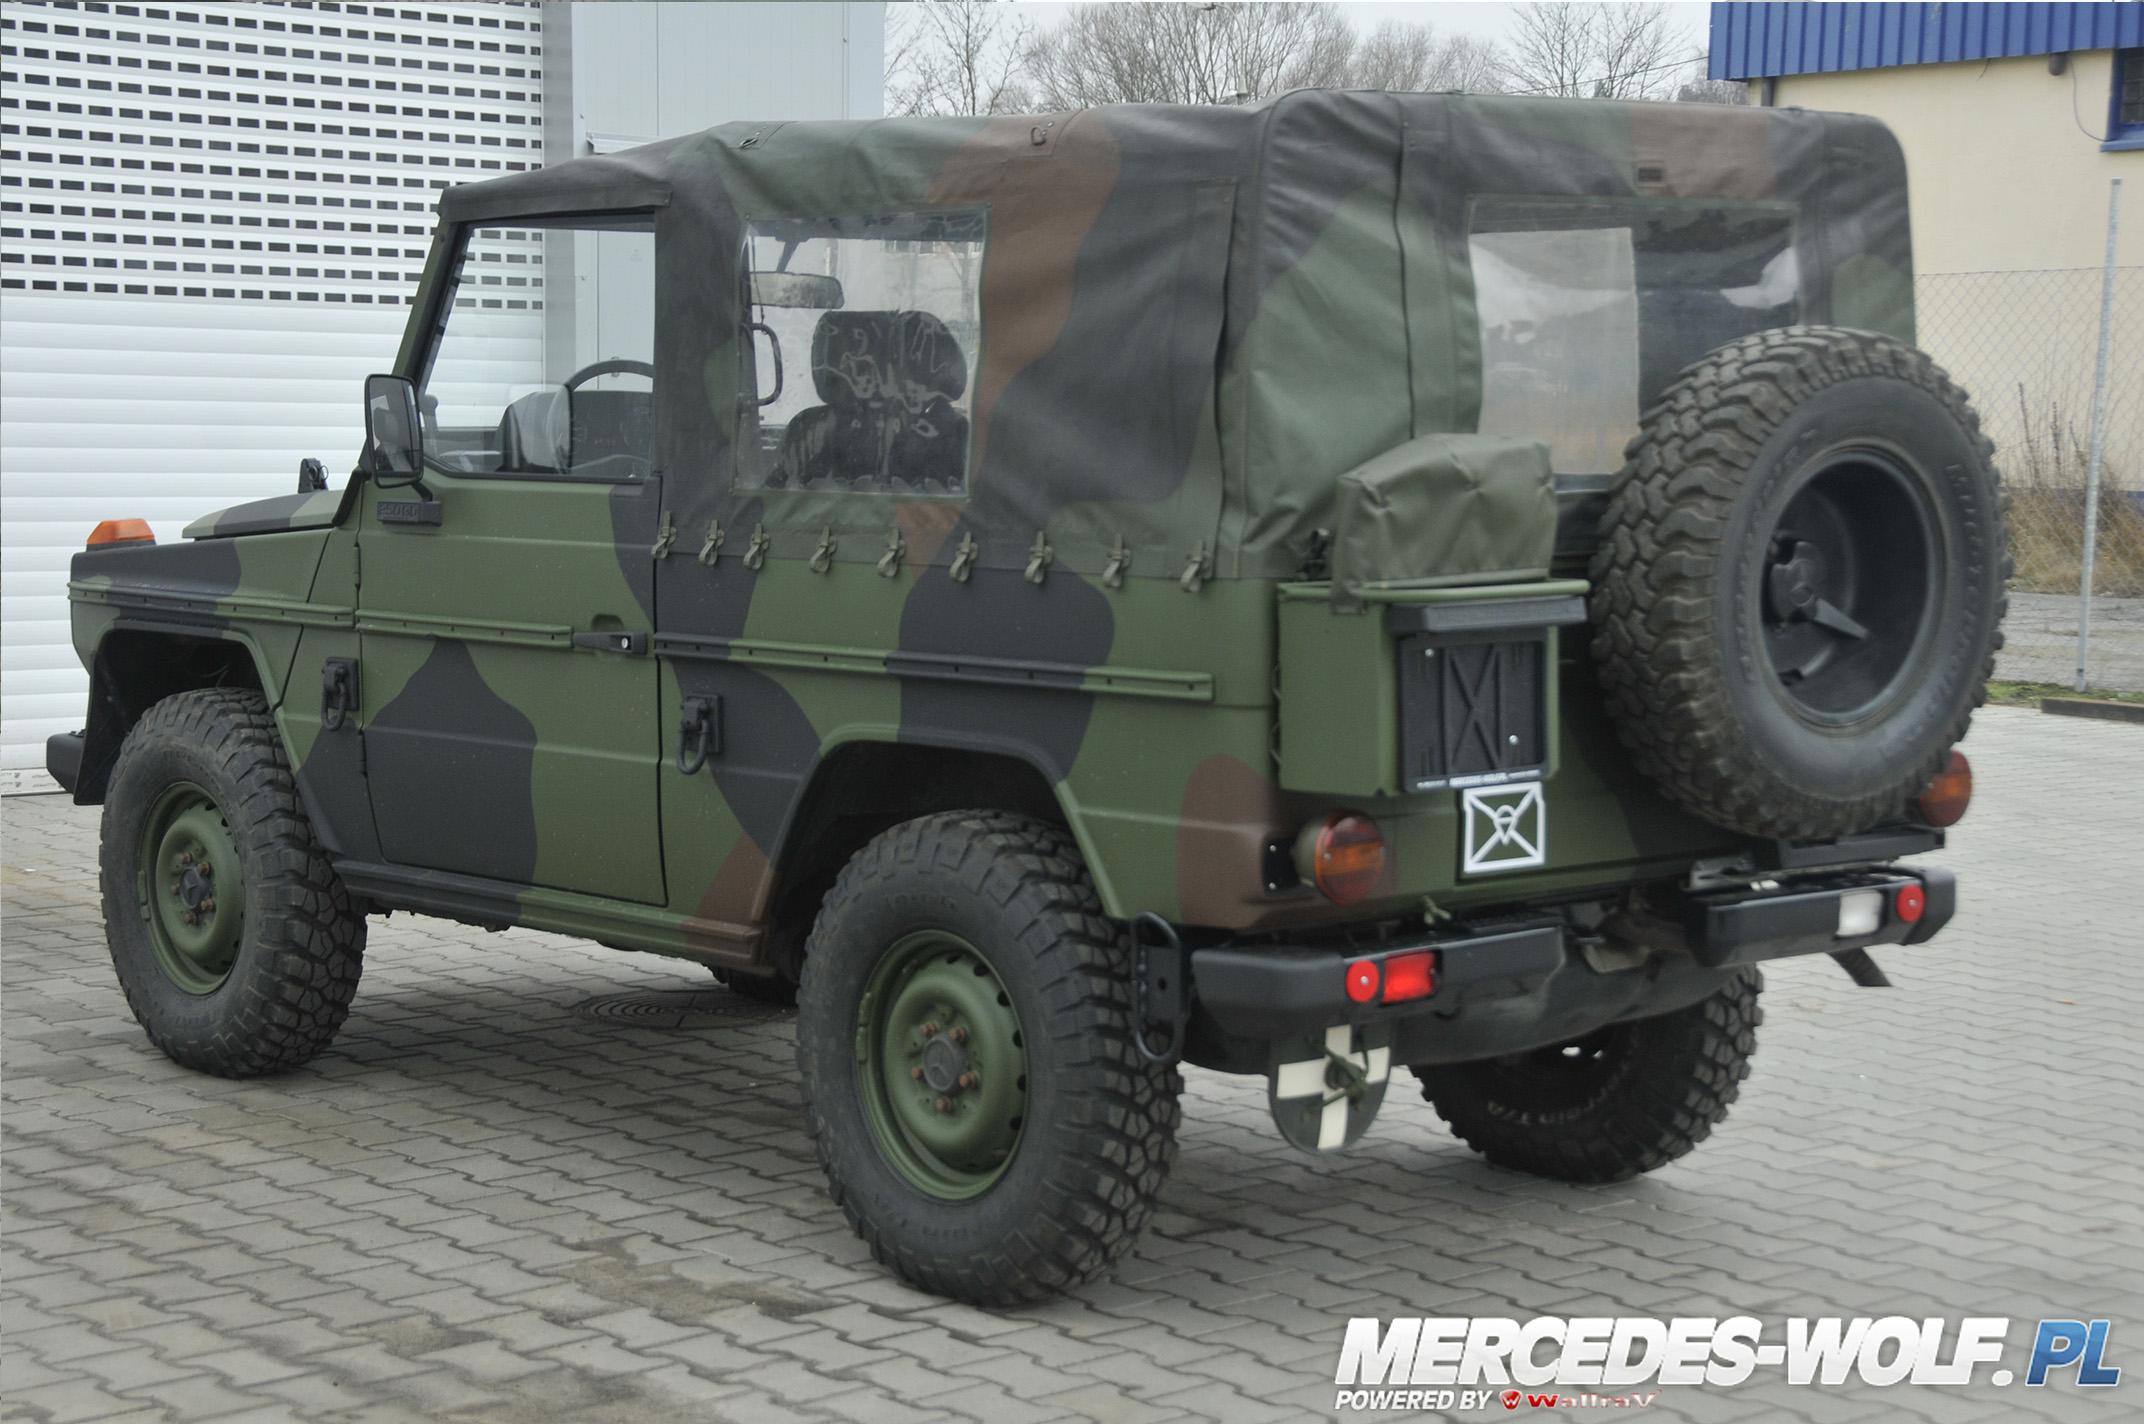 mercedes benz 250gd wolf 71 ll mercedes mercedes g class g force 1 en mercedes. Black Bedroom Furniture Sets. Home Design Ideas